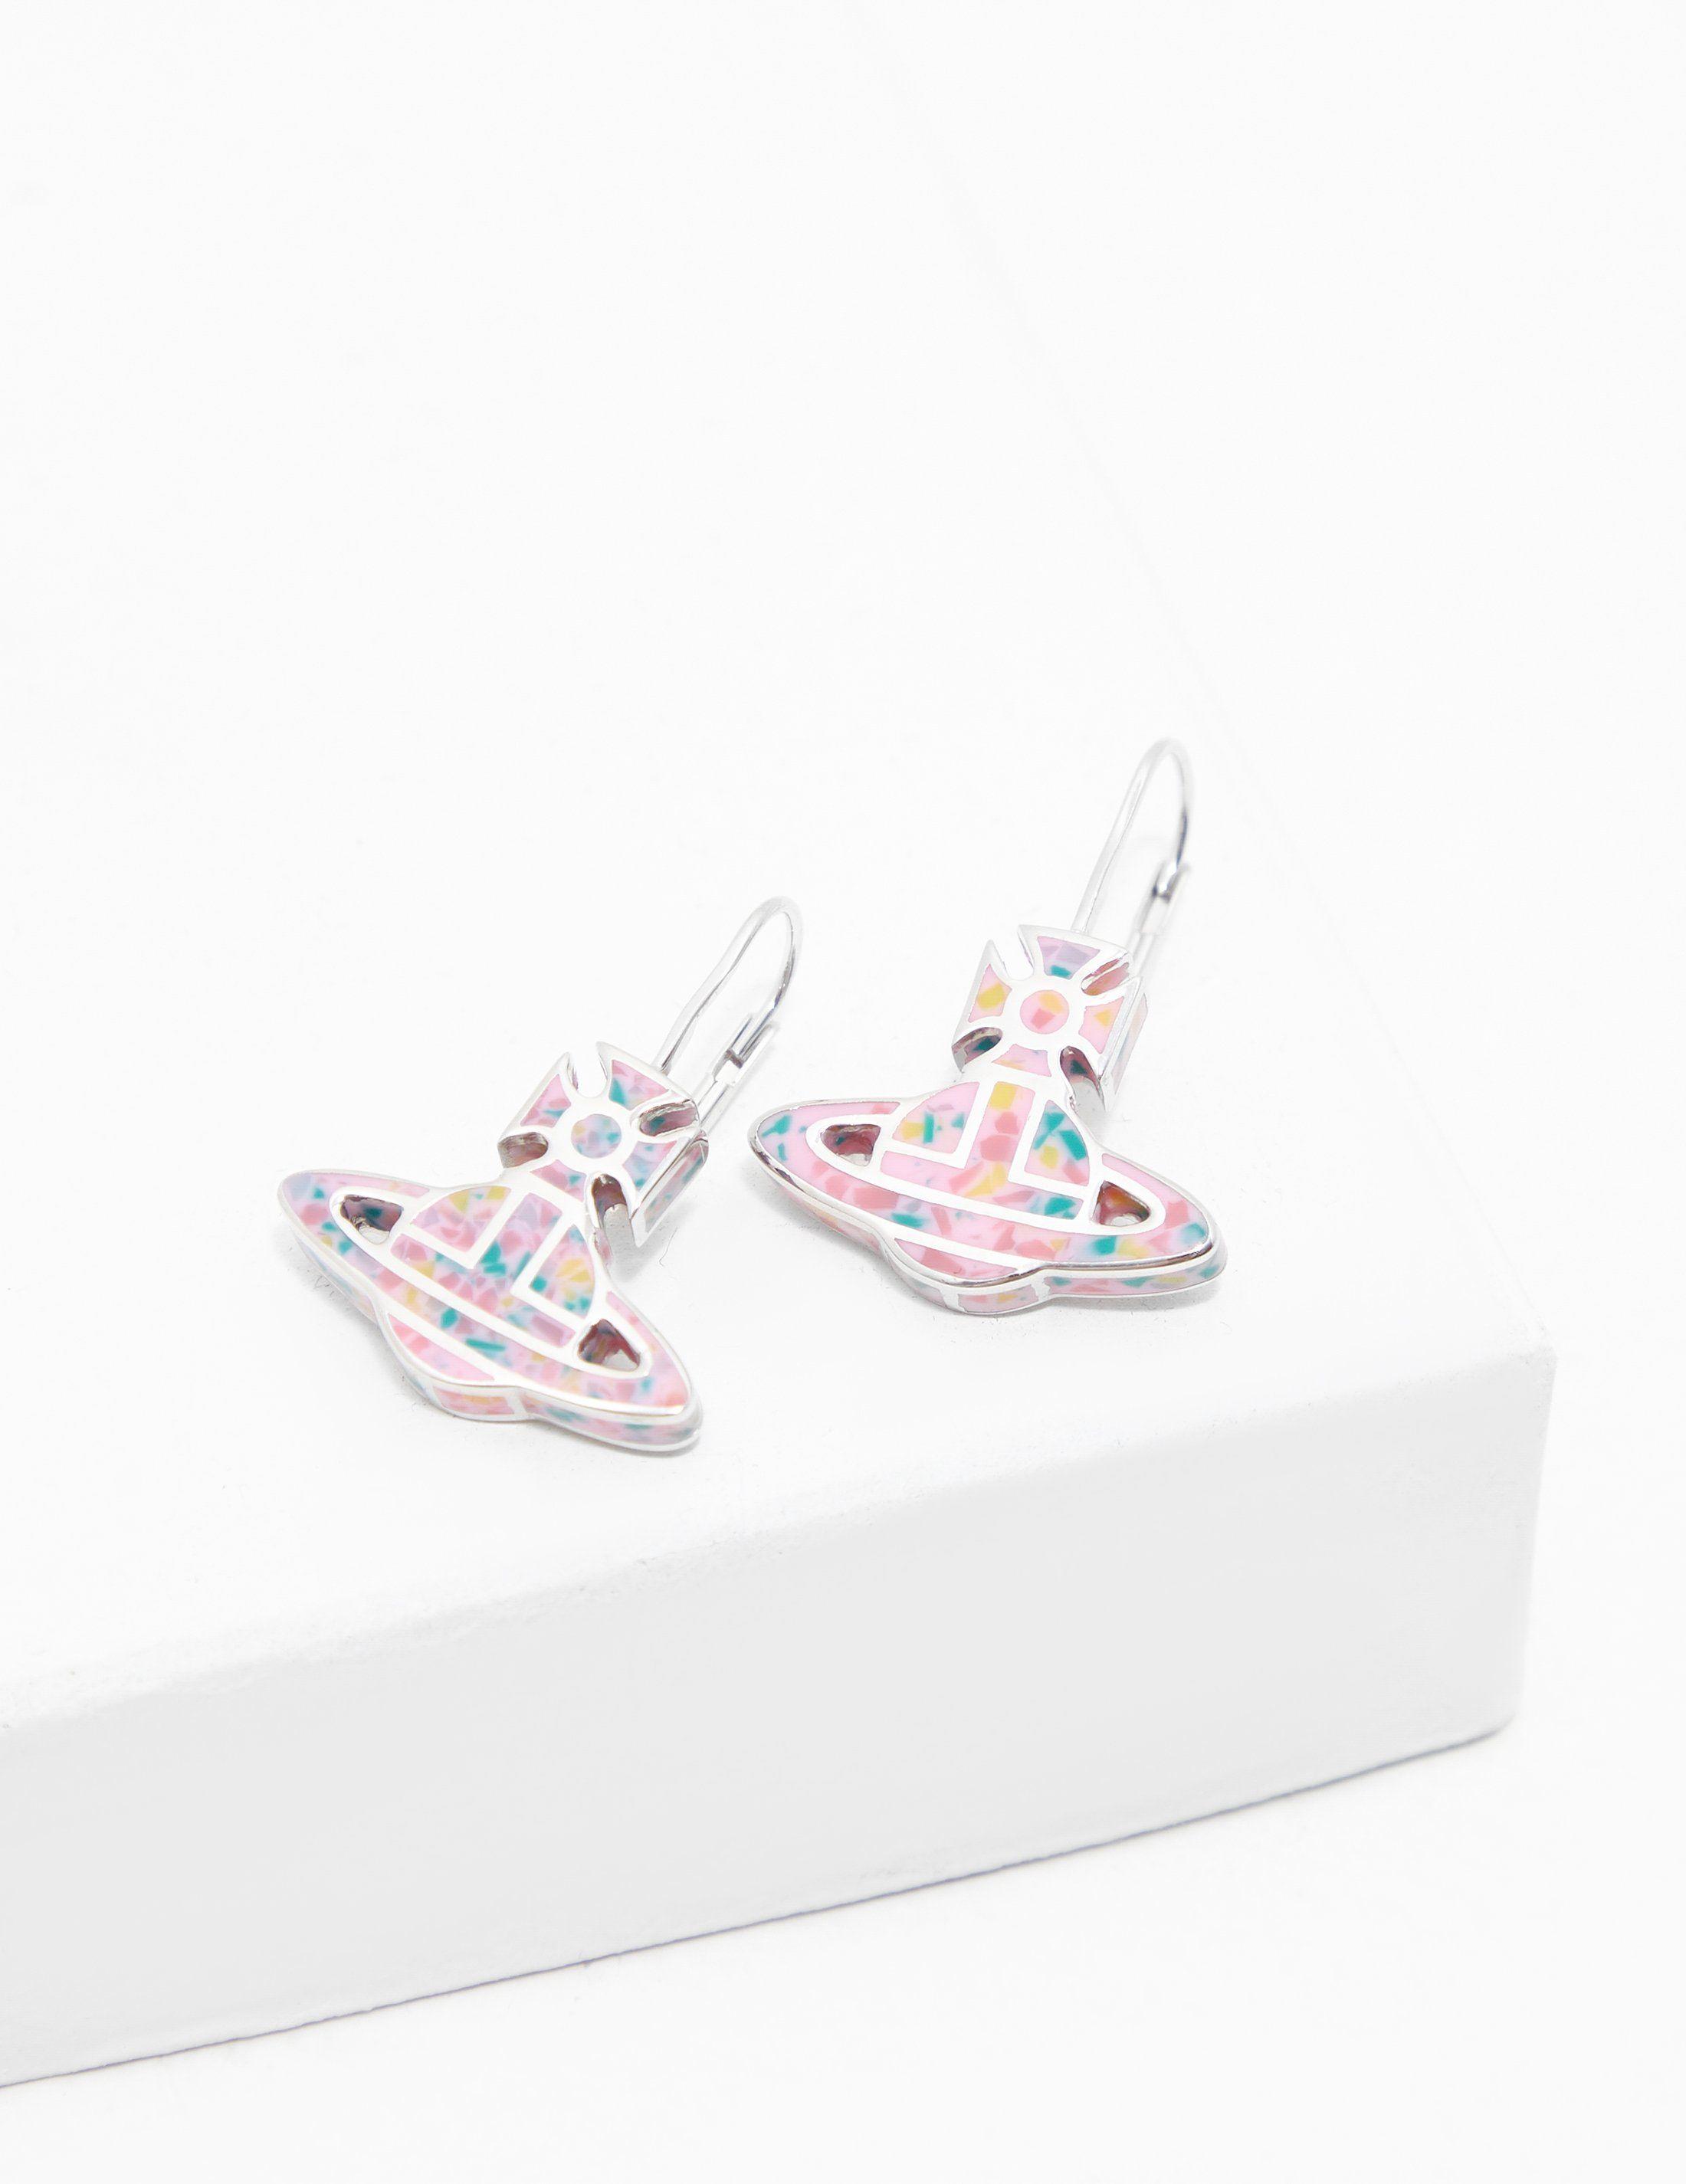 Vivienne Westwood Celeste Earrings